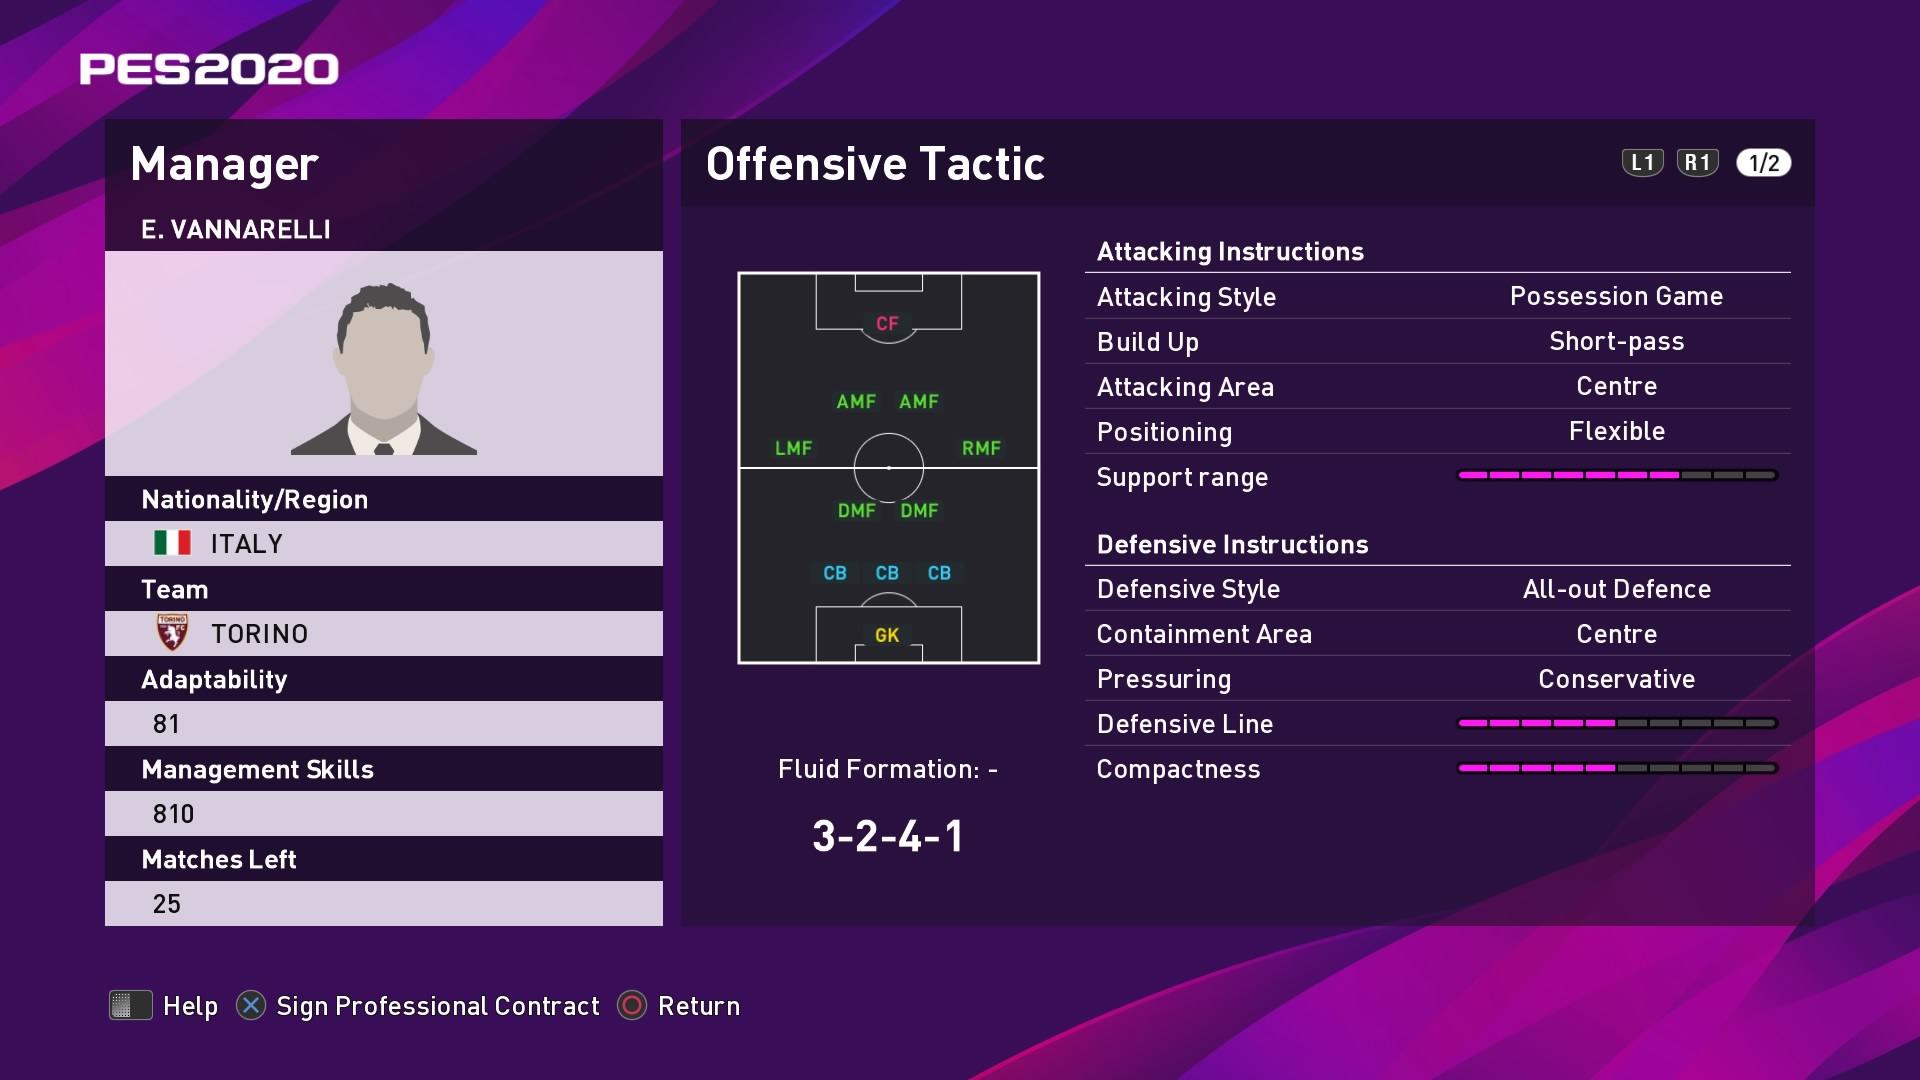 E. Vannarelli (2) (Walter Mazzarri) Offensive Tactic in PES 2020 myClub